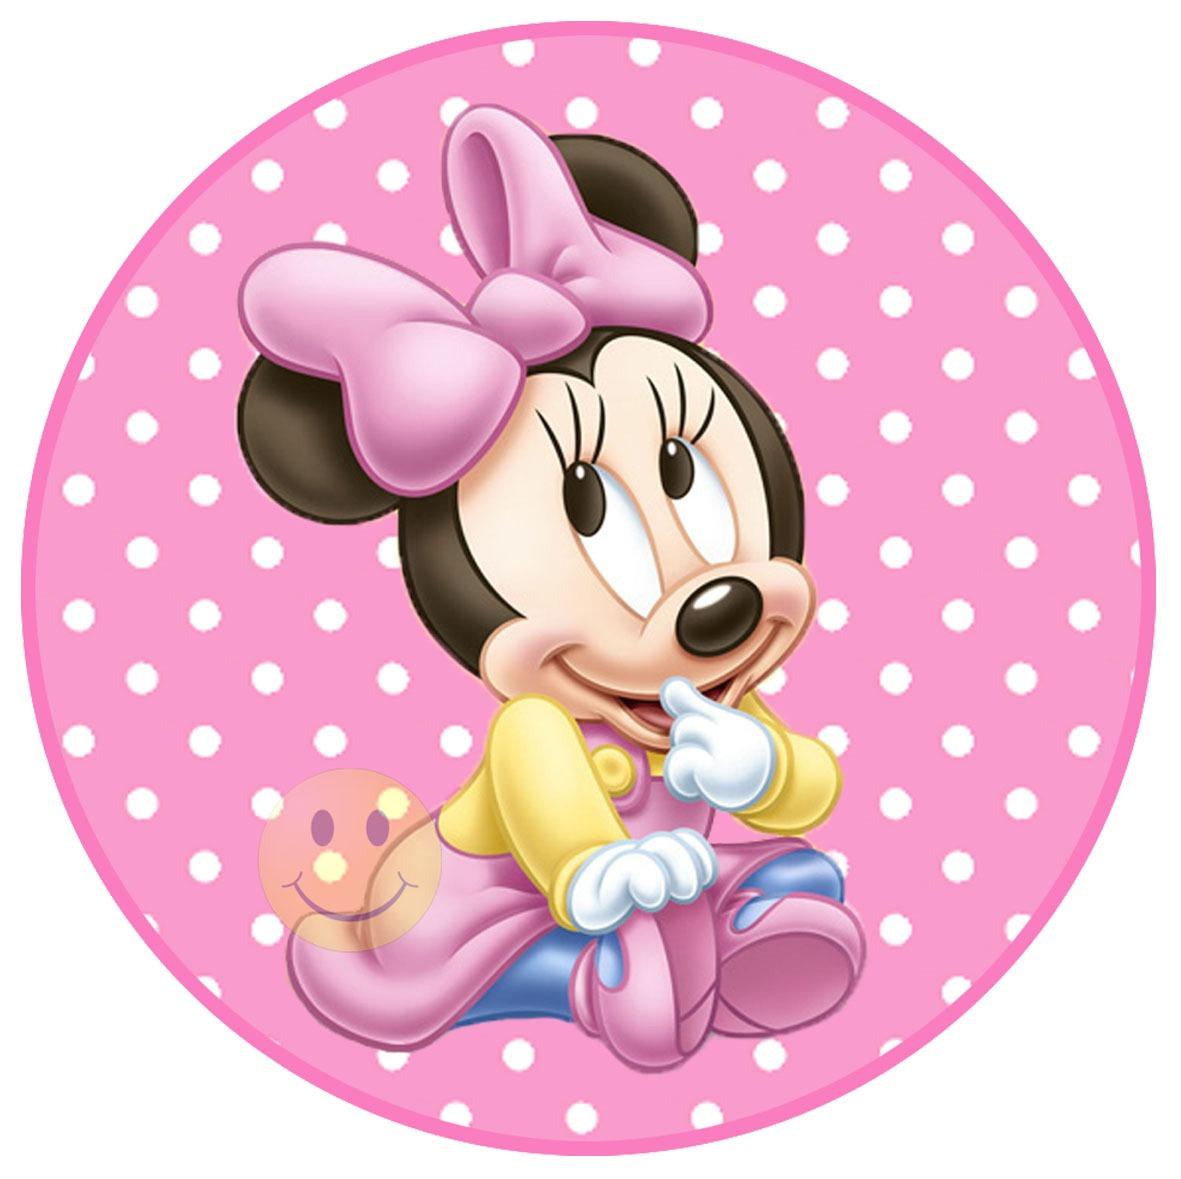 Bellos momentos minnie mouse - Minni et mickey ...